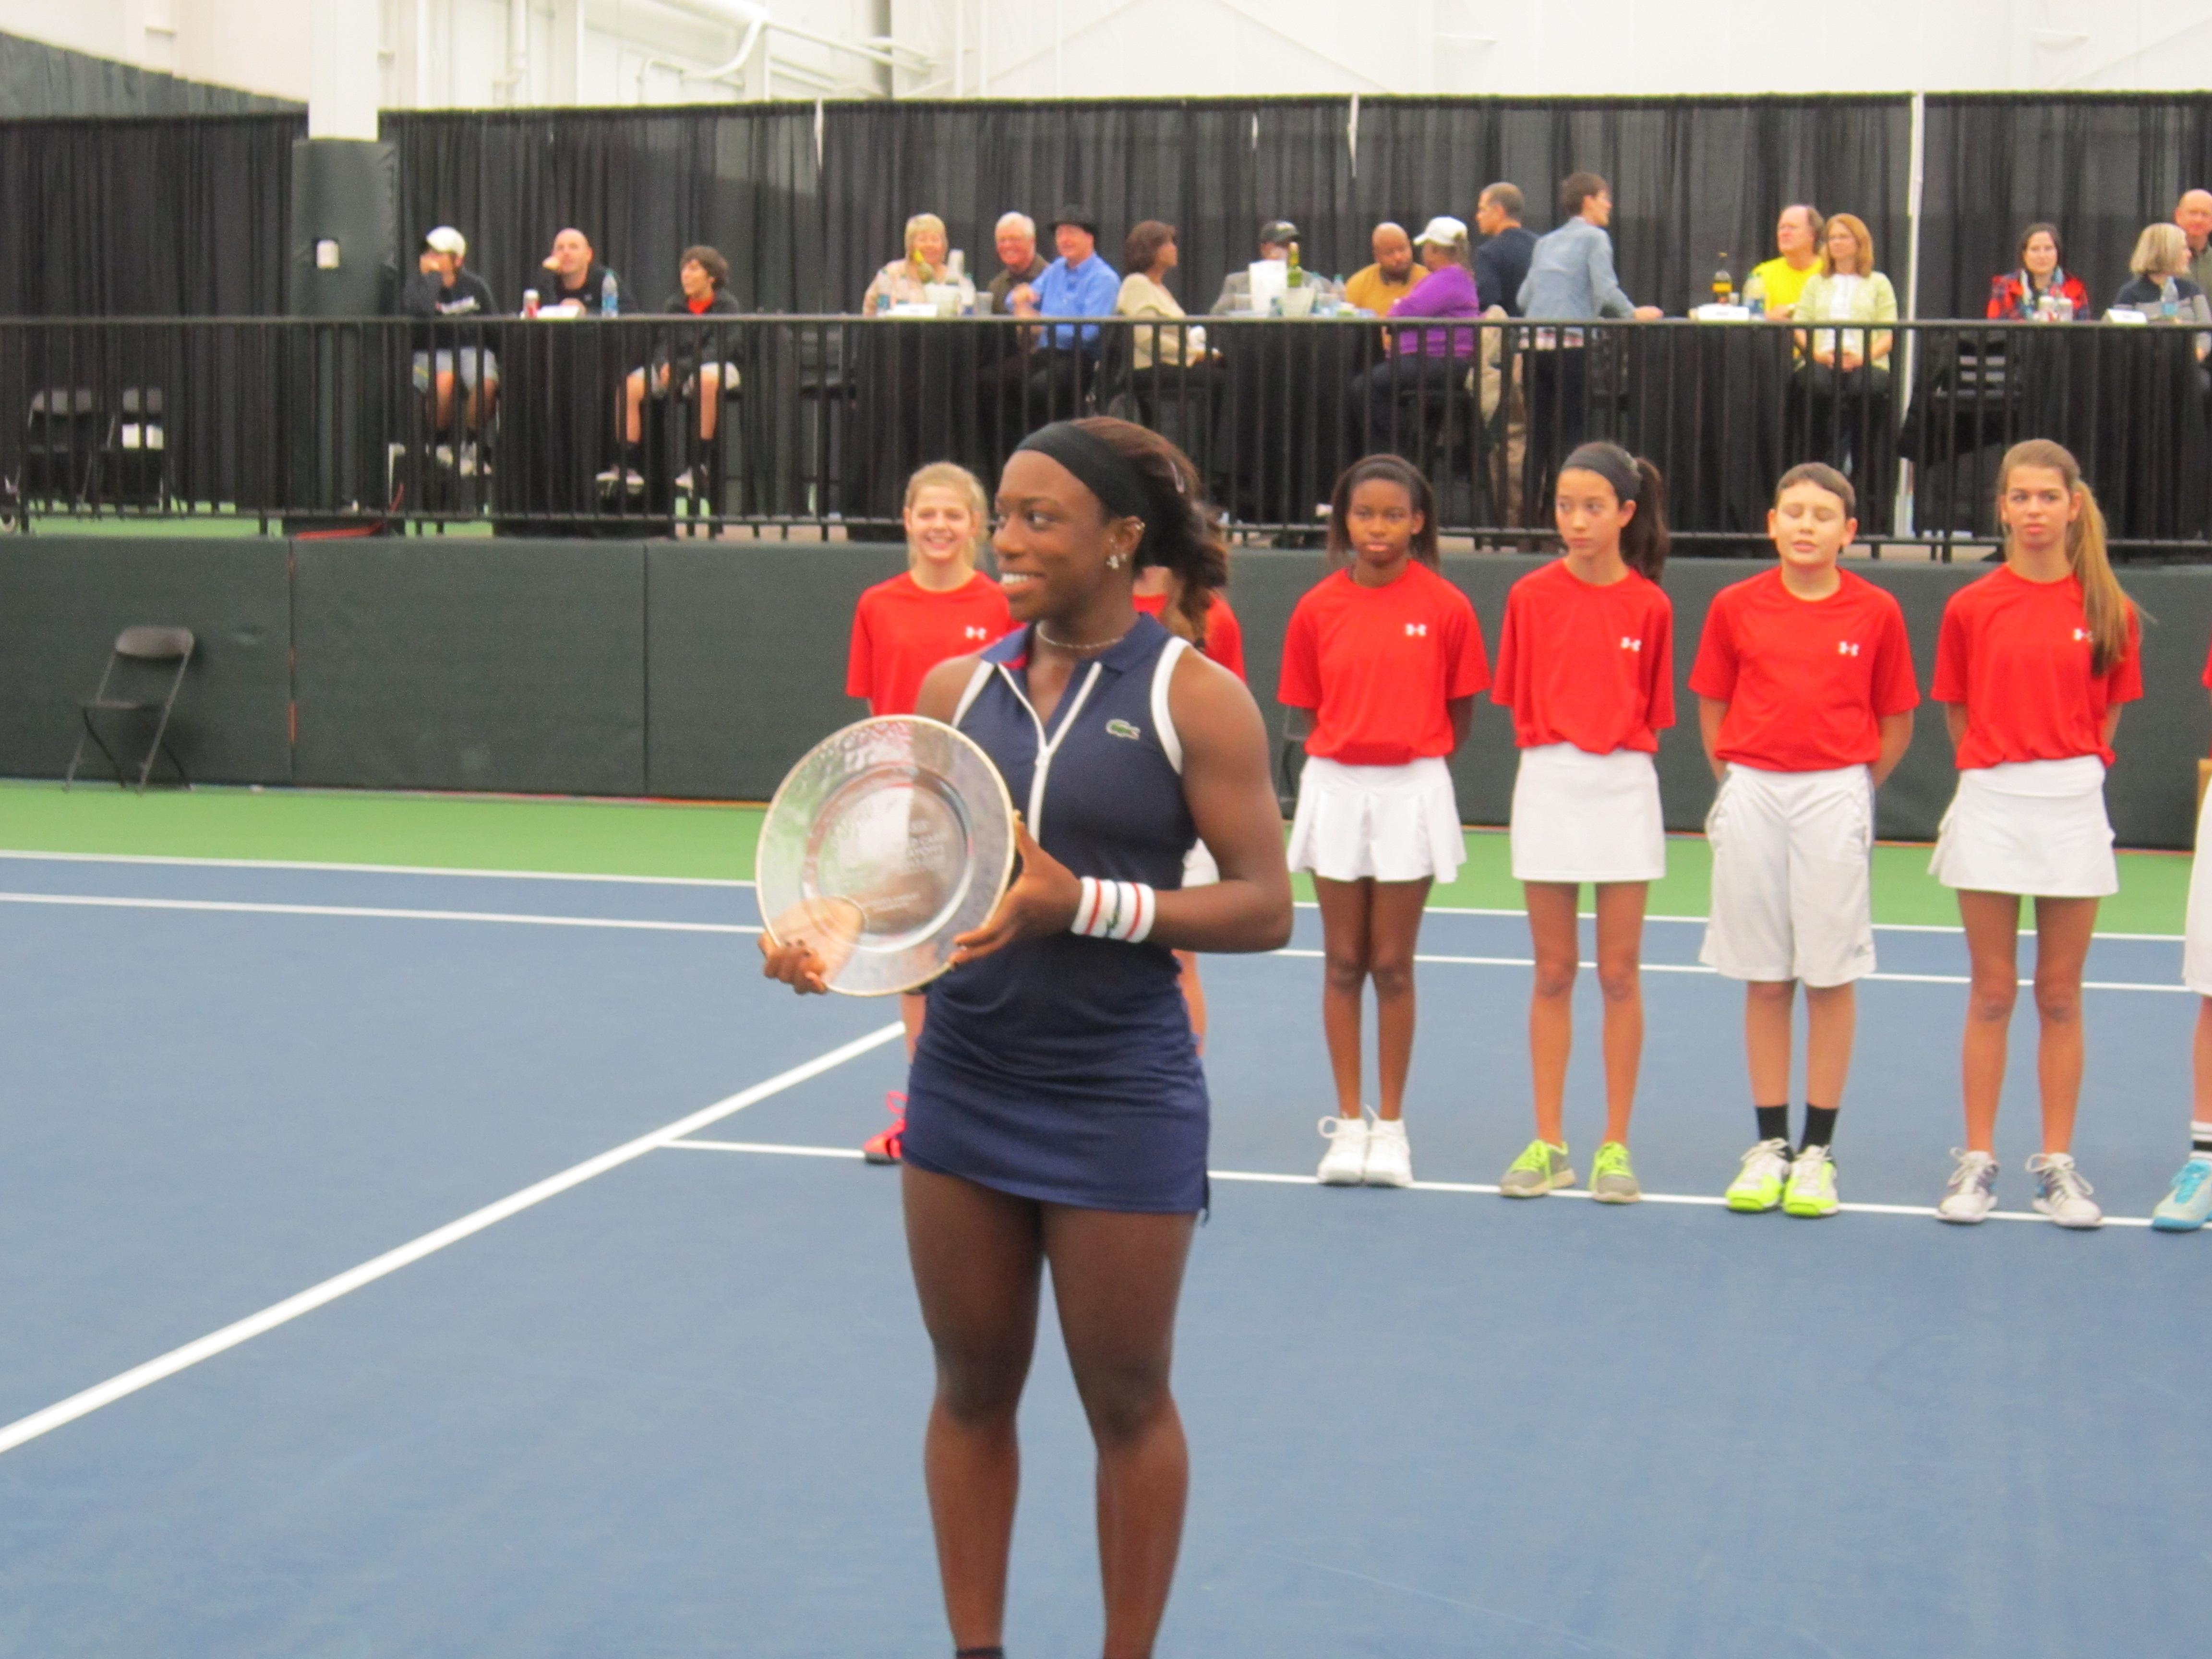 Sachia Vickery Tennis Atlantic